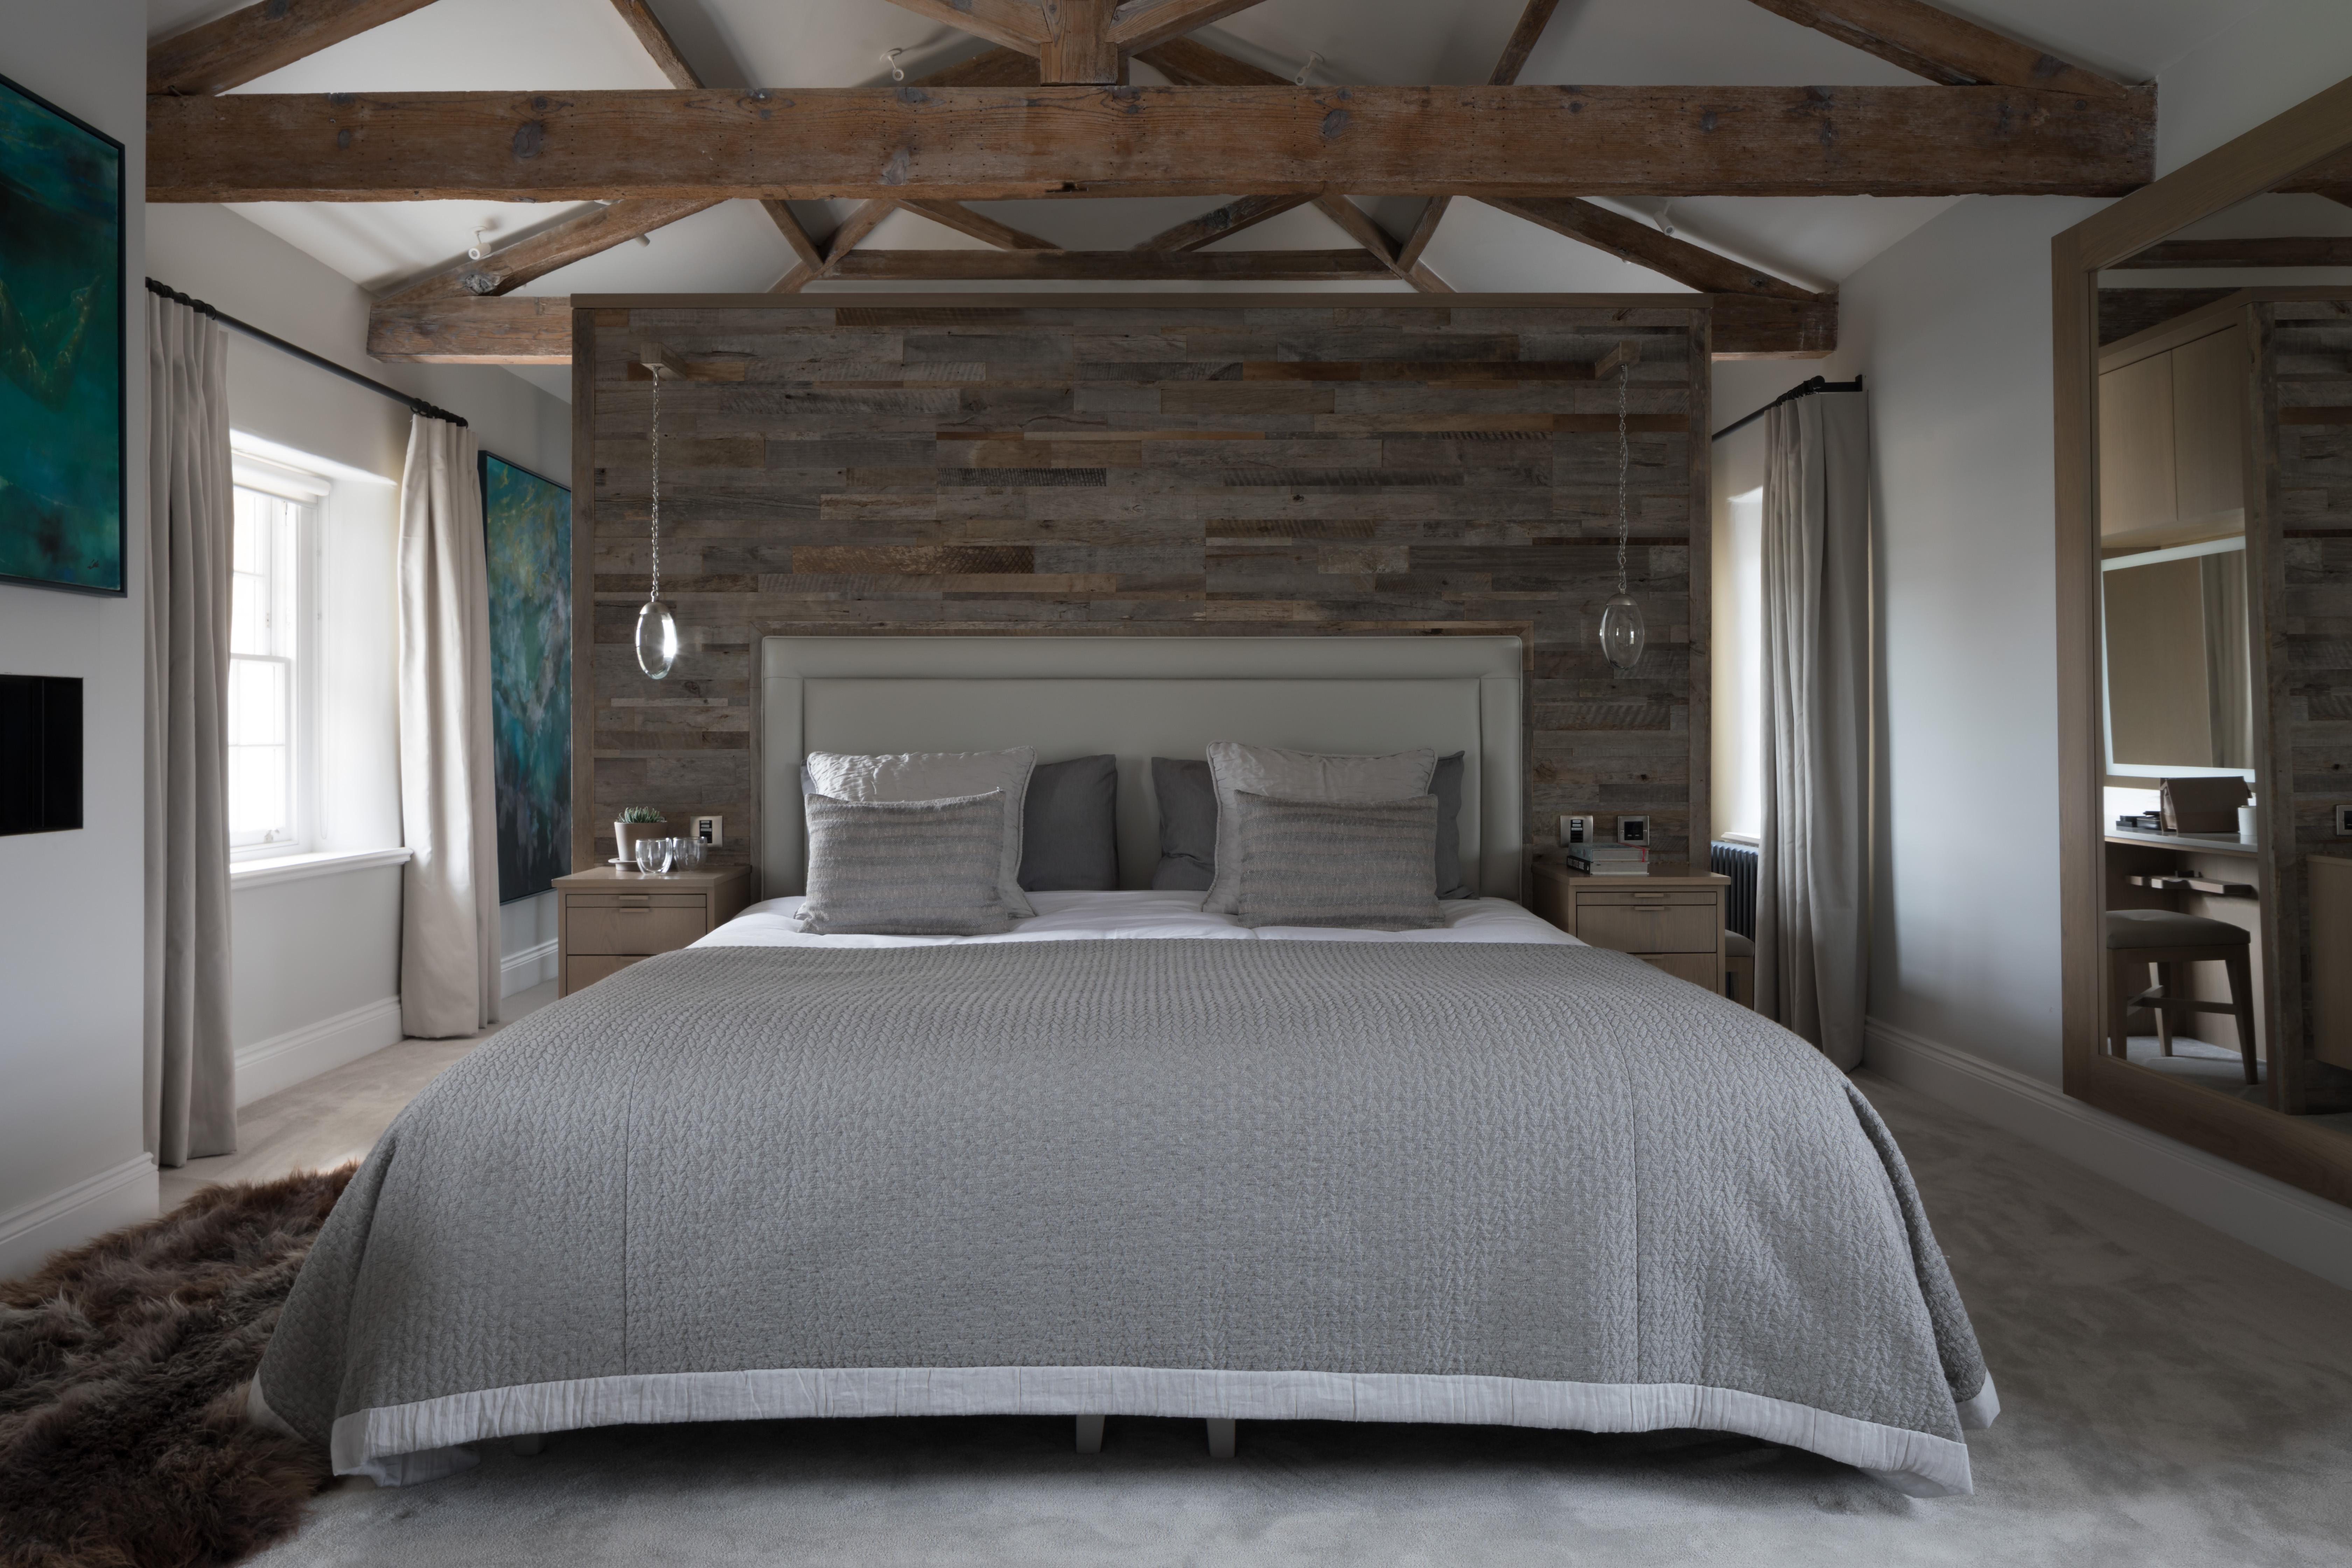 Northamptonshire Family House Interior Design